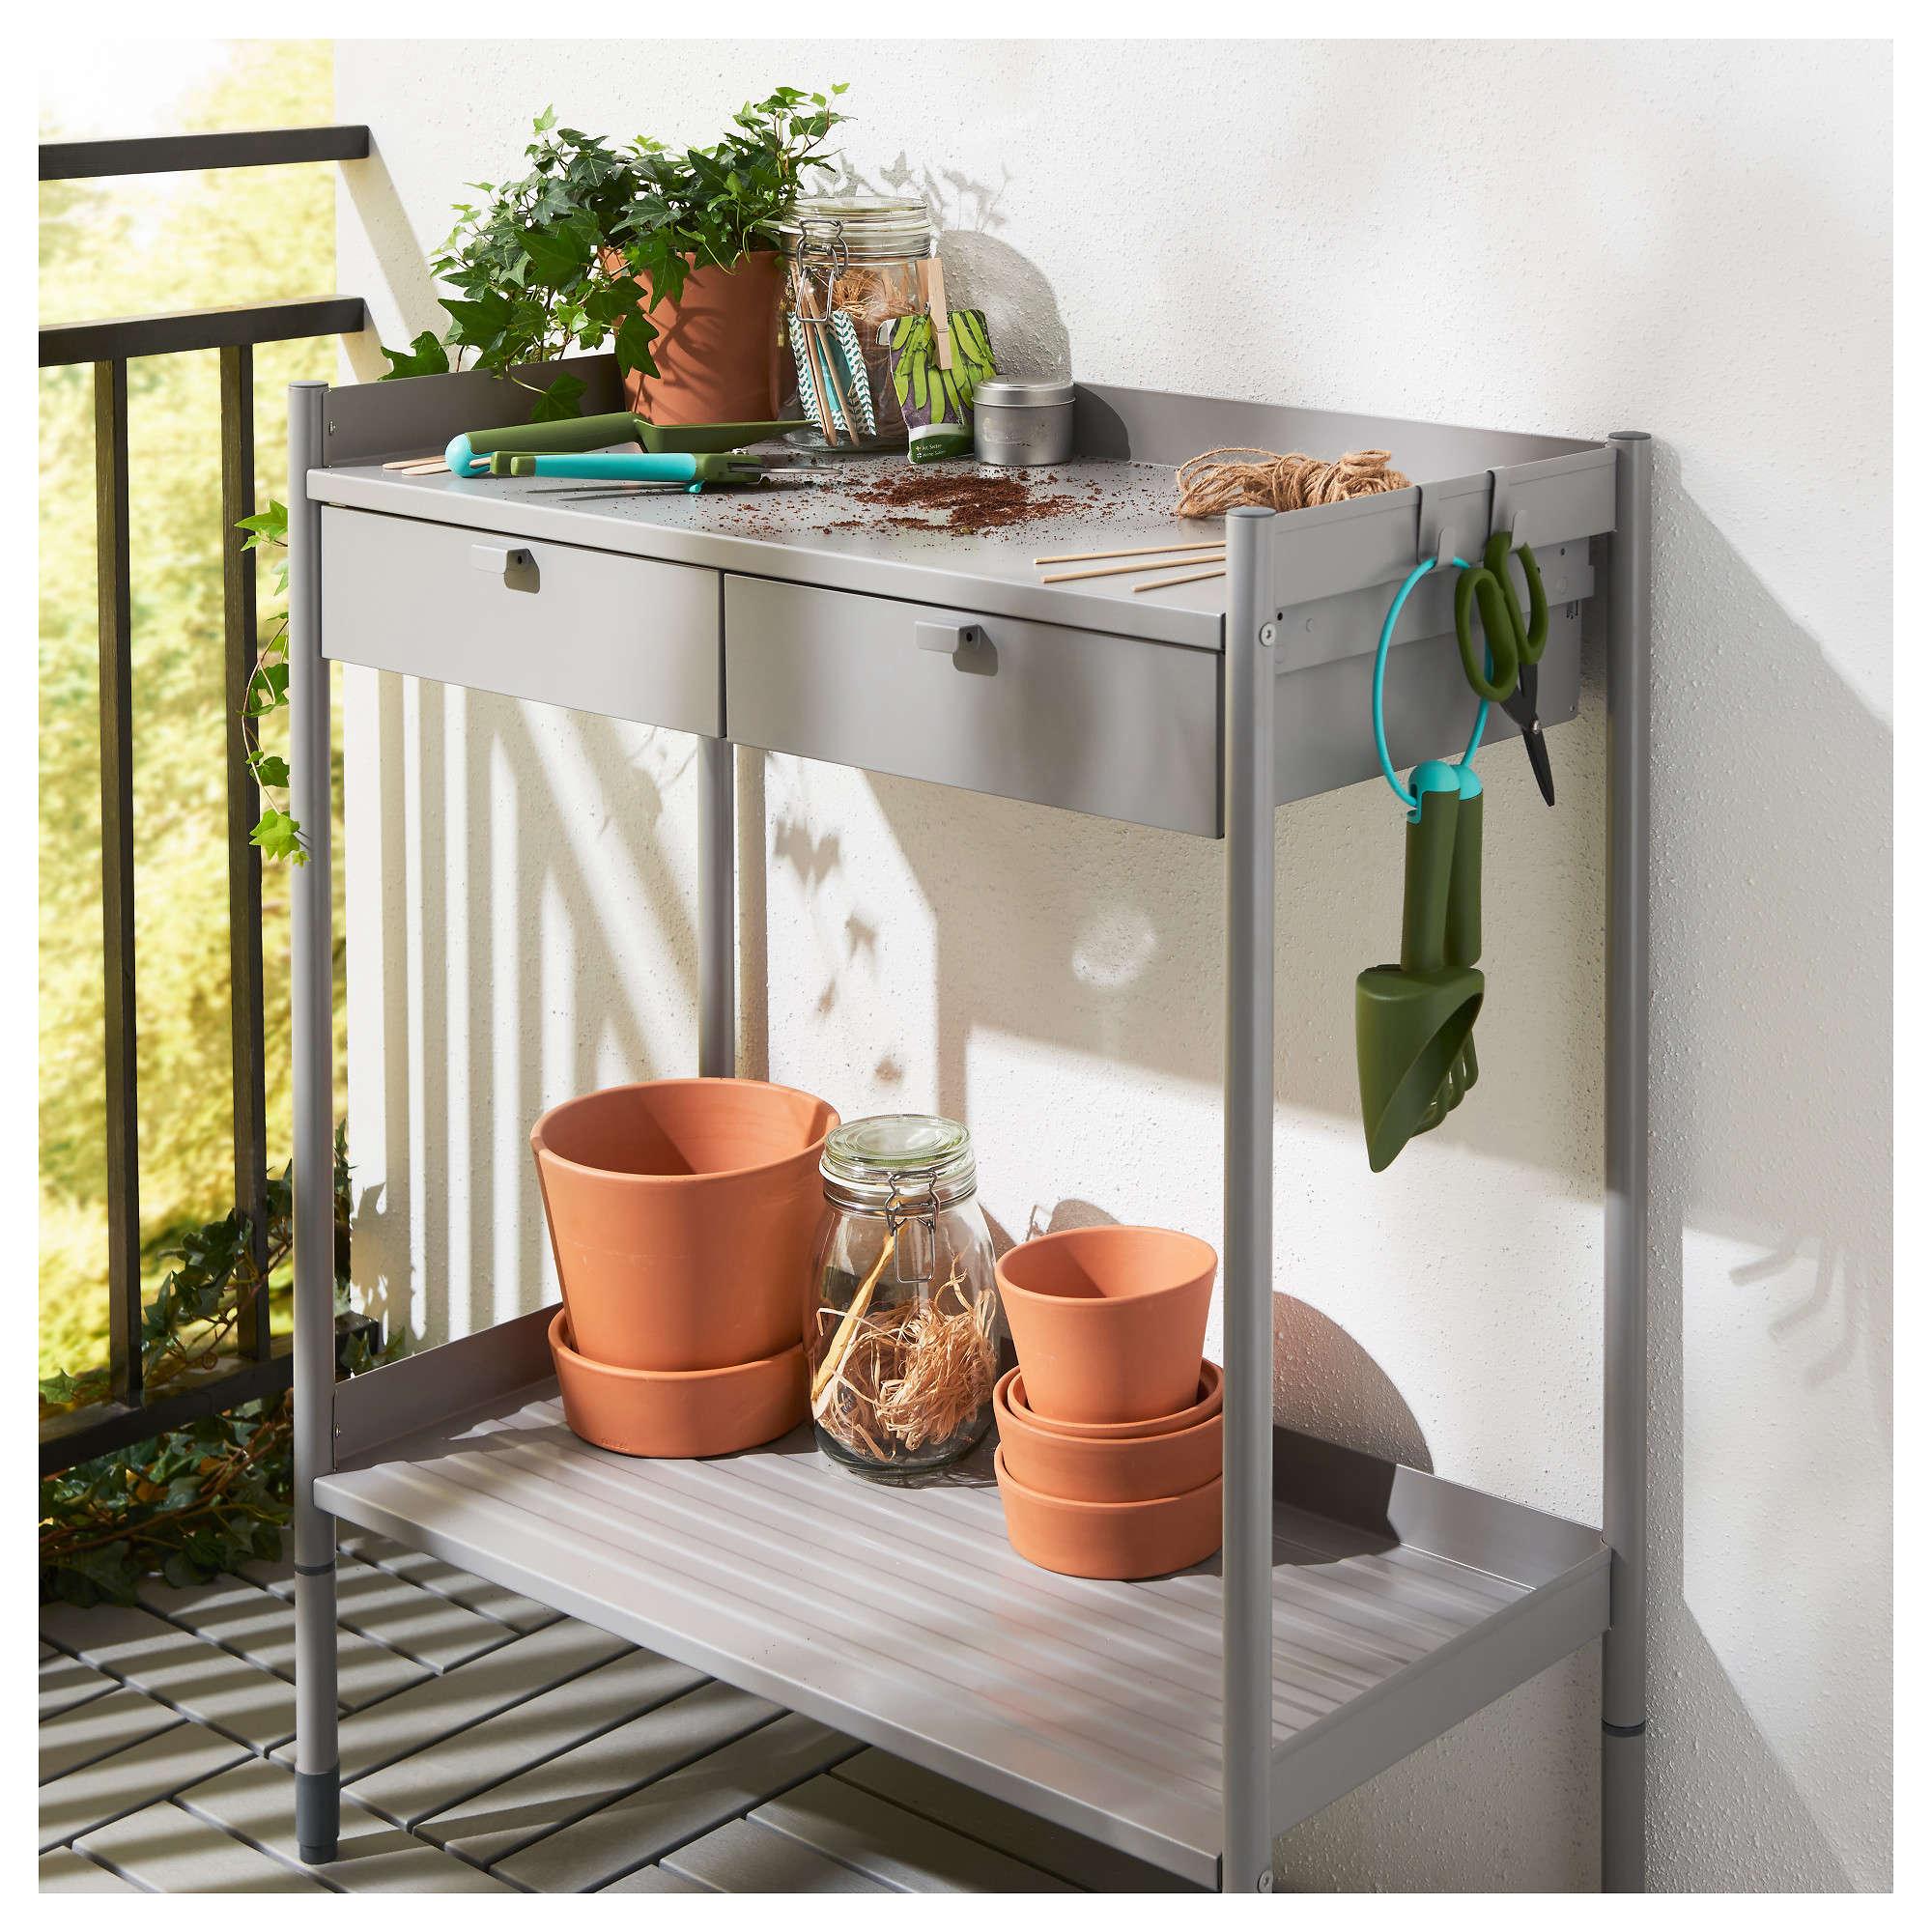 Best of Ikea 8: Potting Shed and Garden Storage - Gardenista